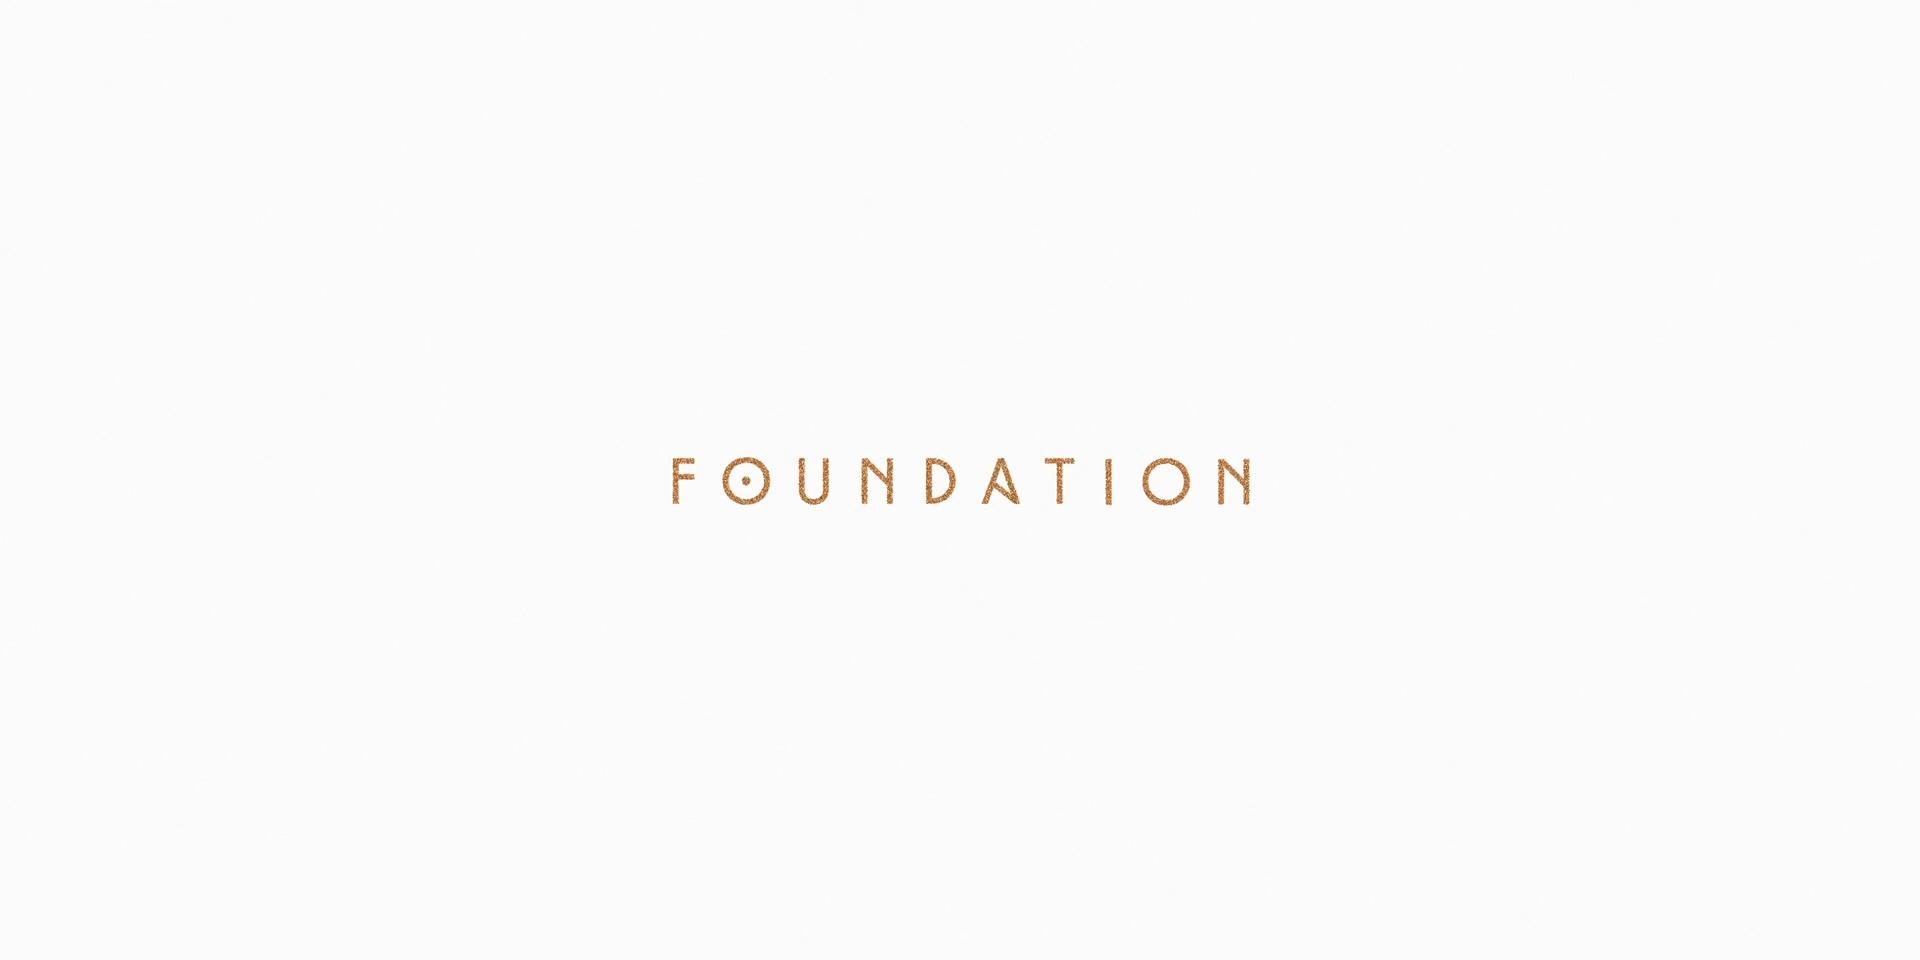 Fundación Temporada 1 (2021) 1080p WEB-DL Latino